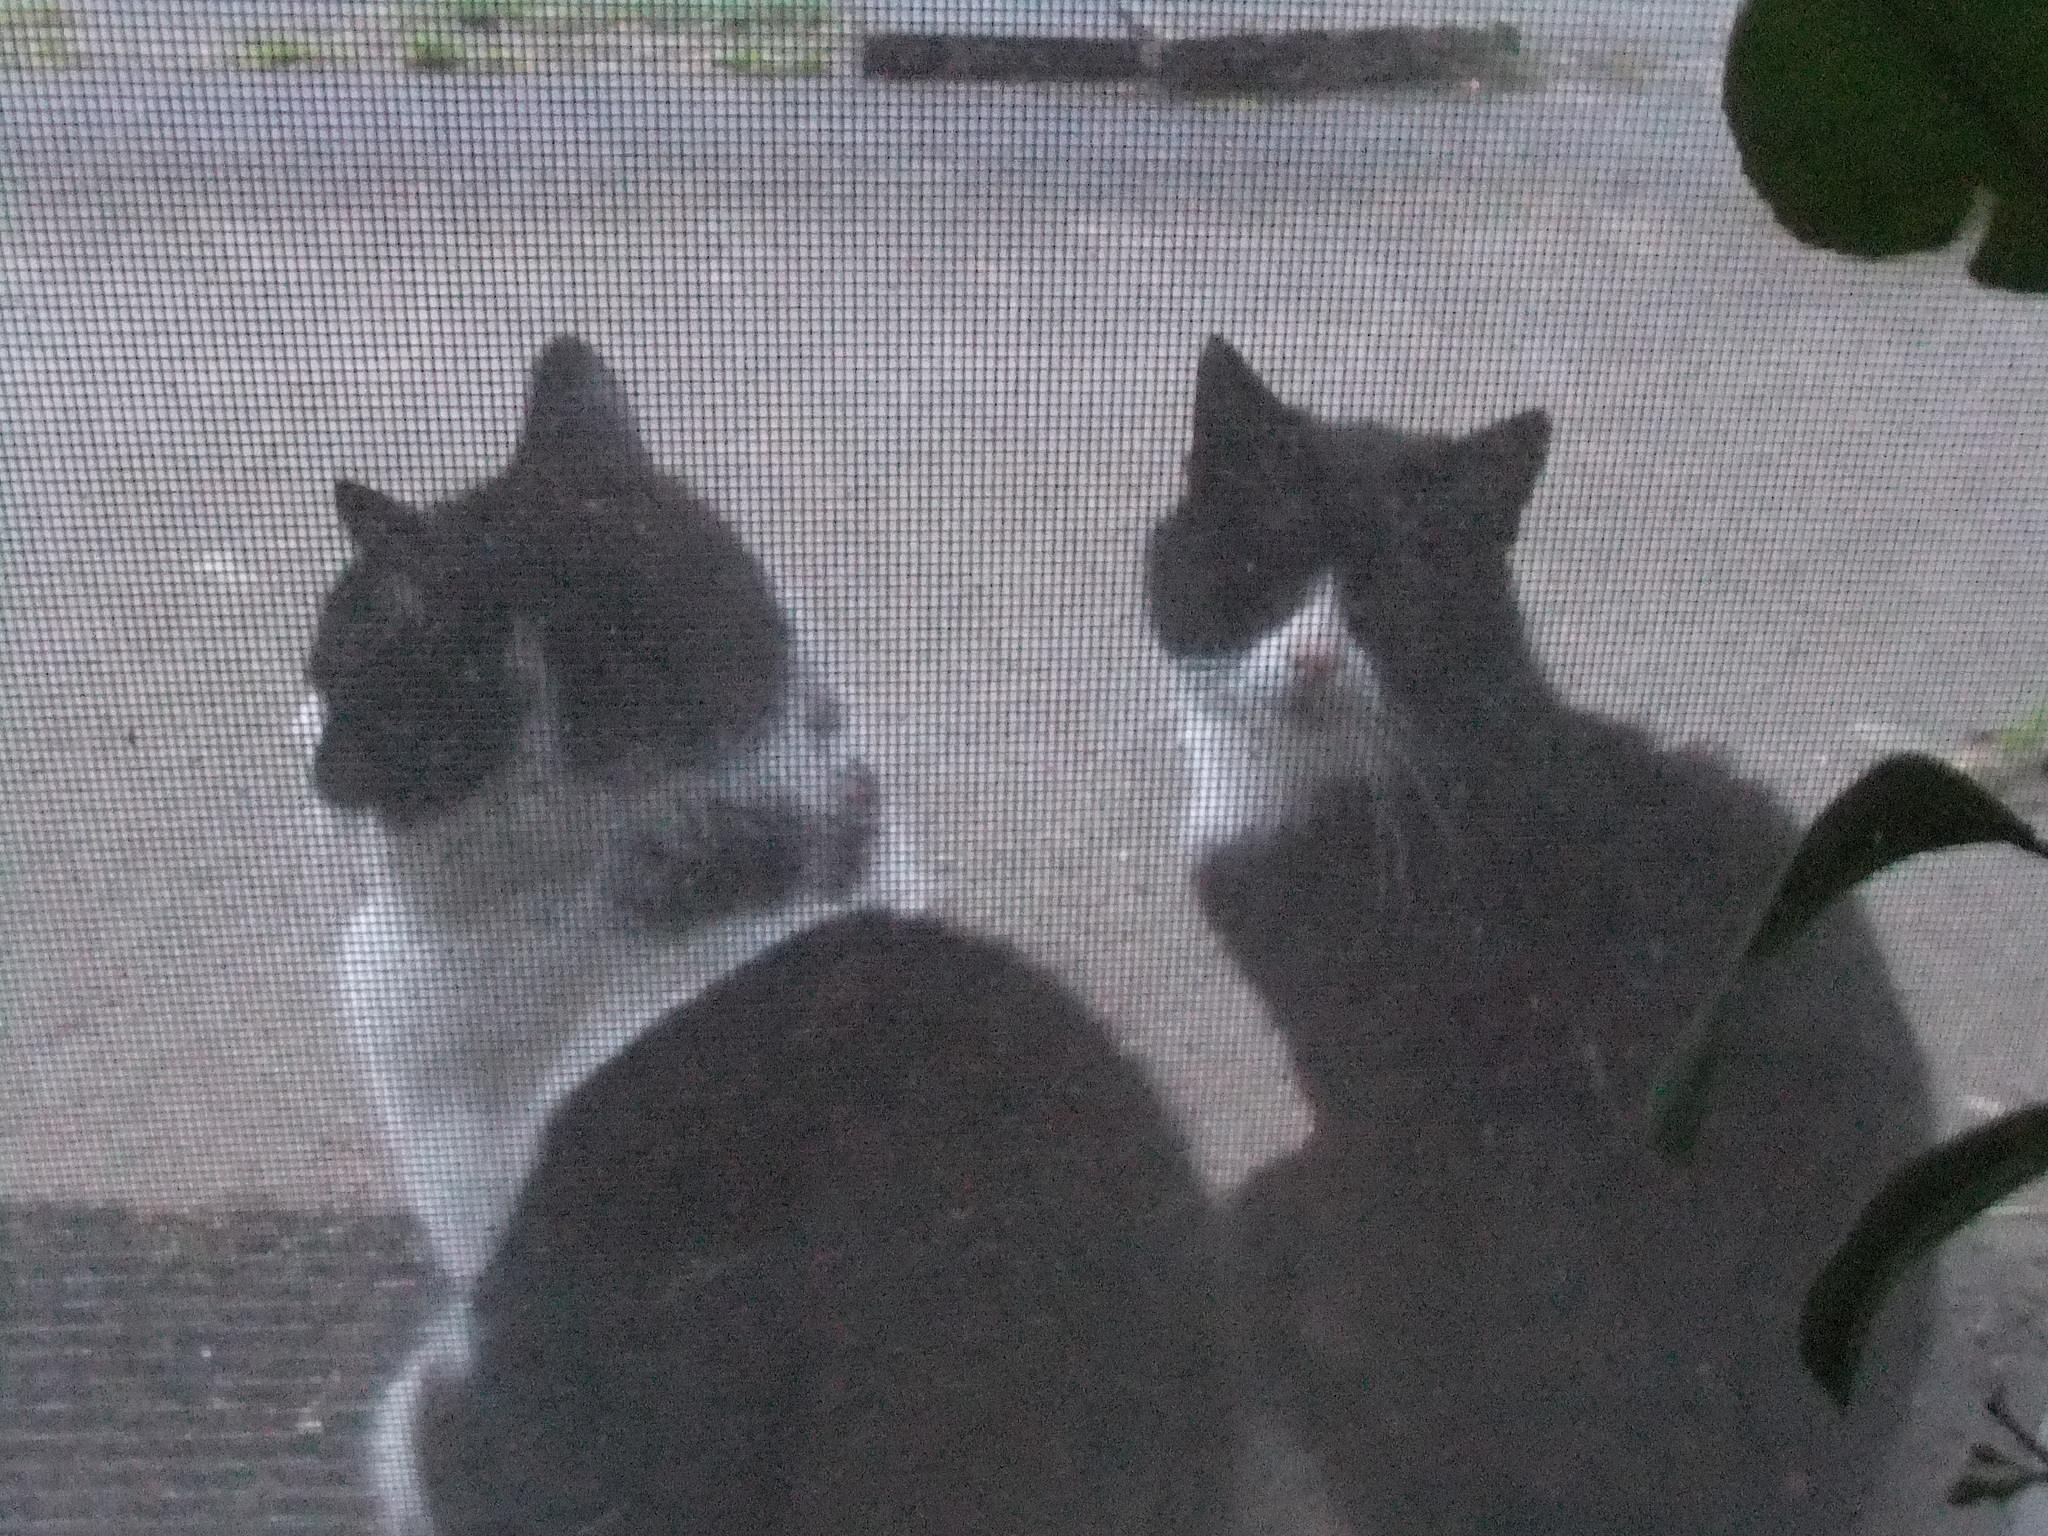 2 cats behind a screen door by Oliver Neumann